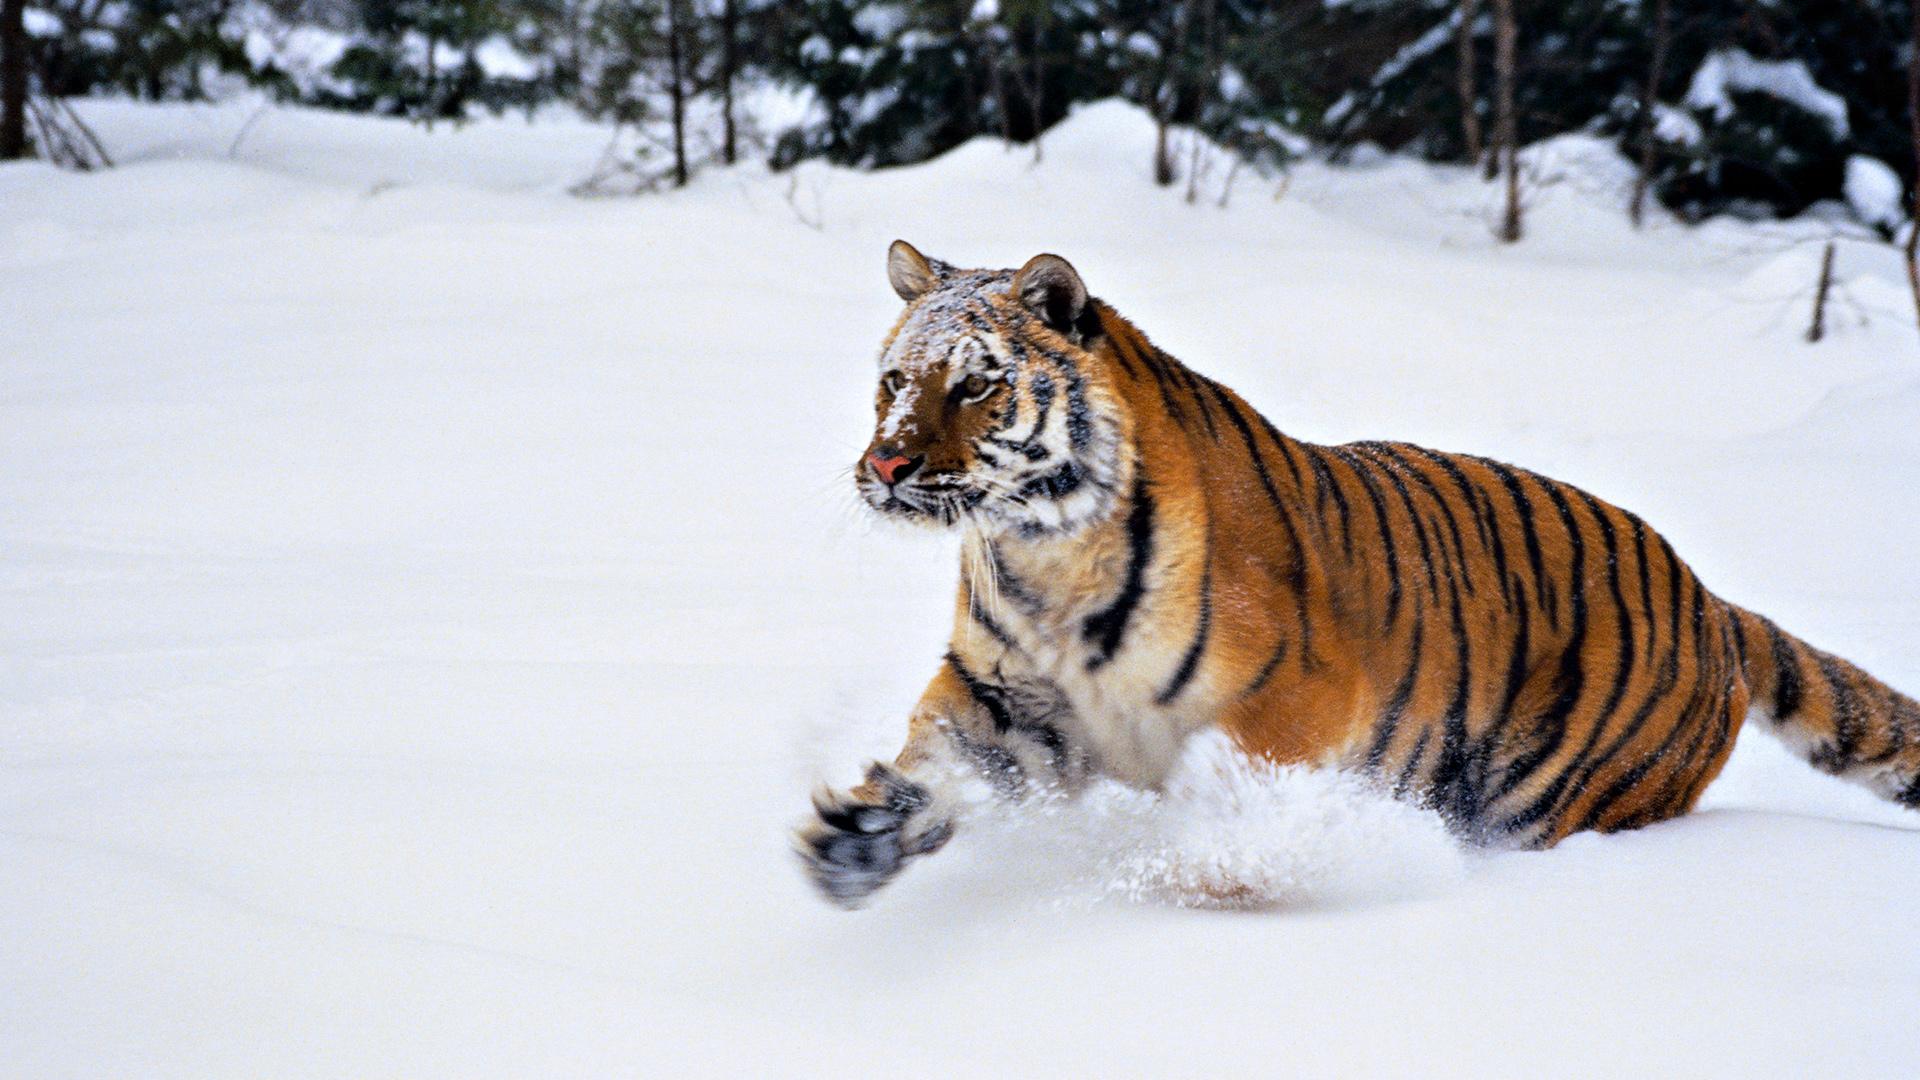 Animals Tiger Snow Wallpapers Hd Desktop And Mobile: Snow Tiger Wallpaper